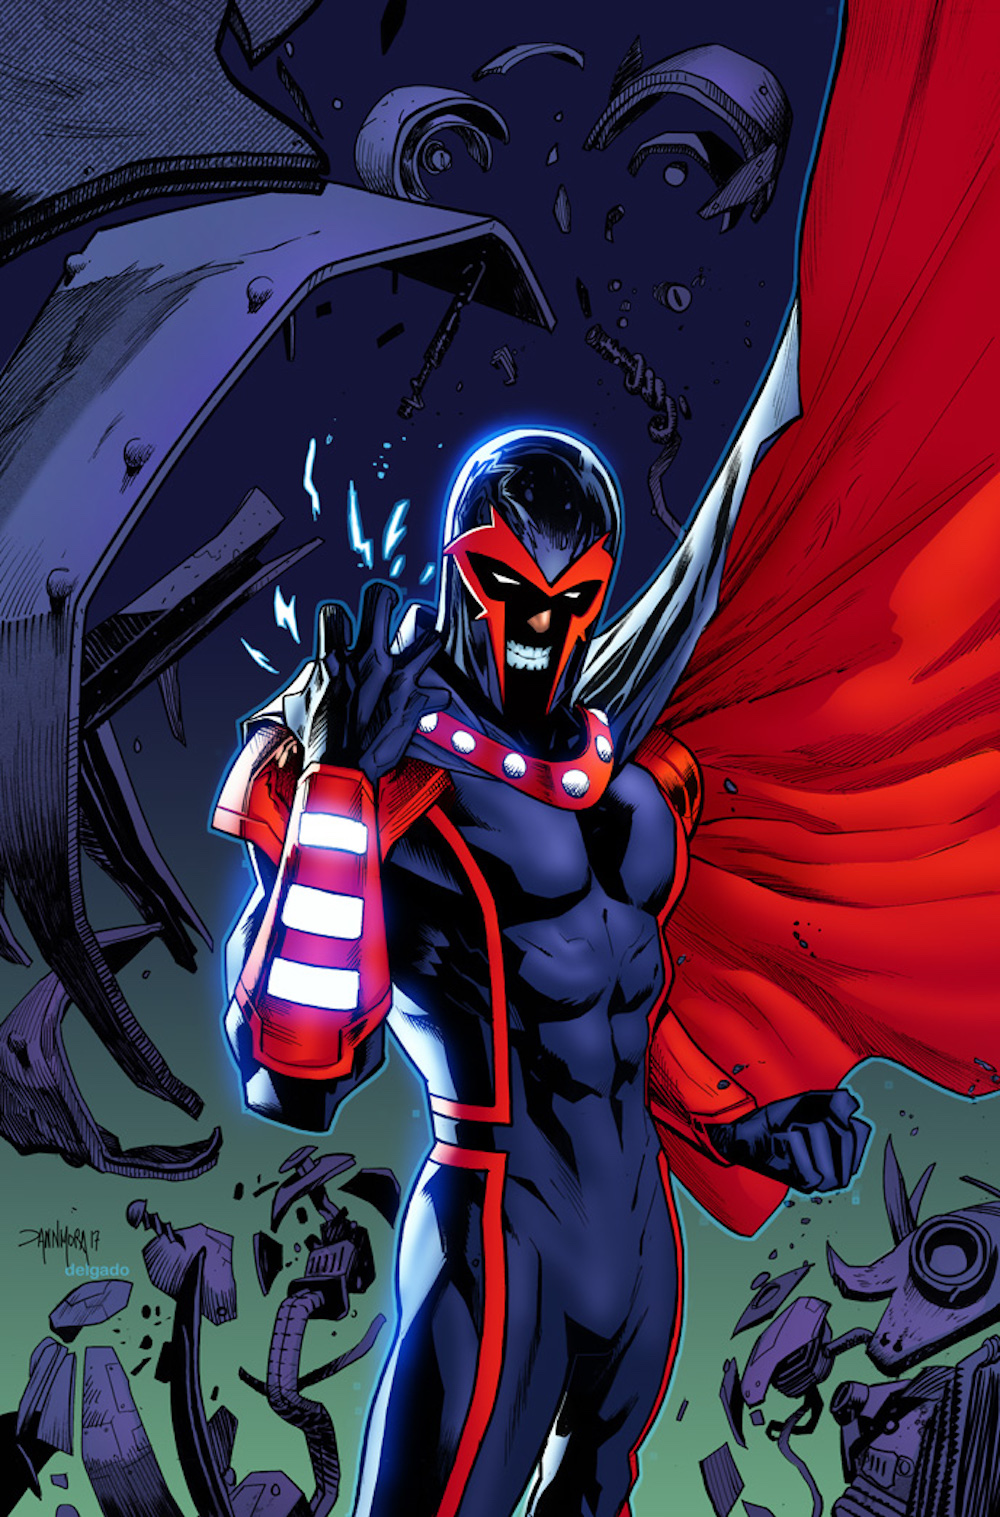 Secret Empire #5 - Magneto variant cover